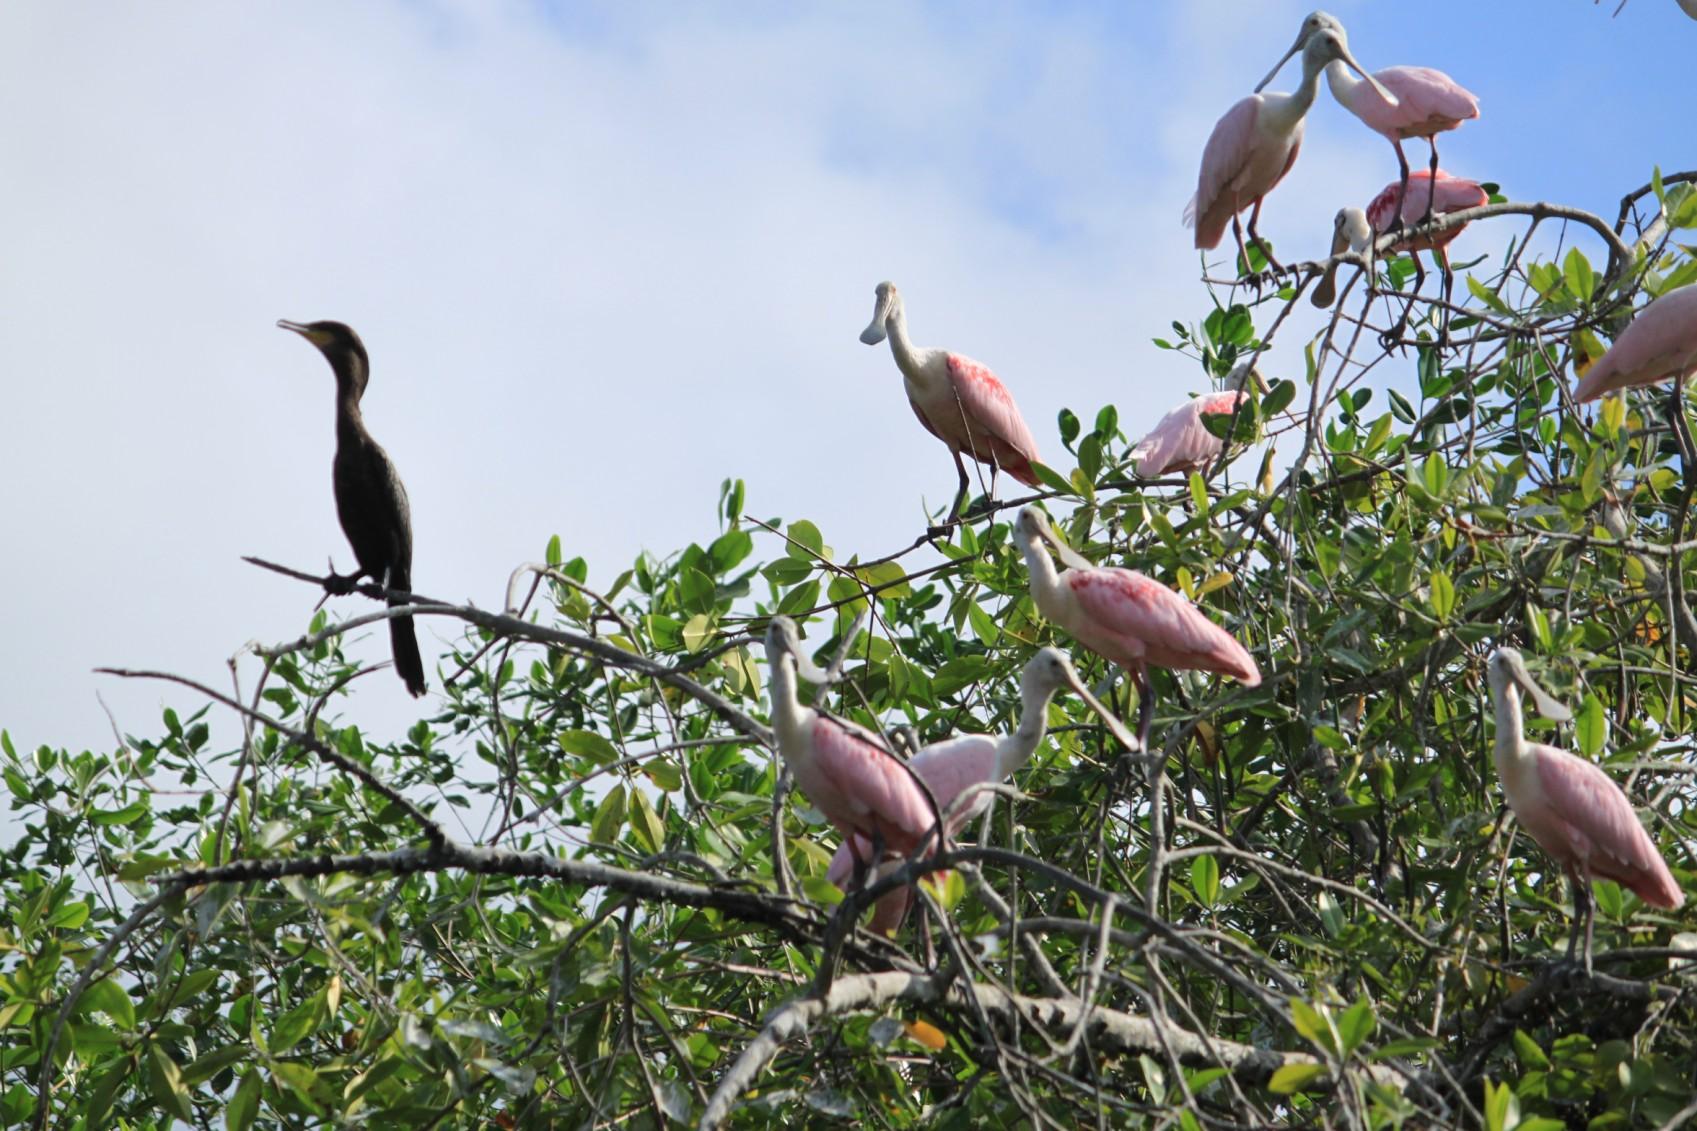 ecu18-explore-the-mangroves-tropic-free